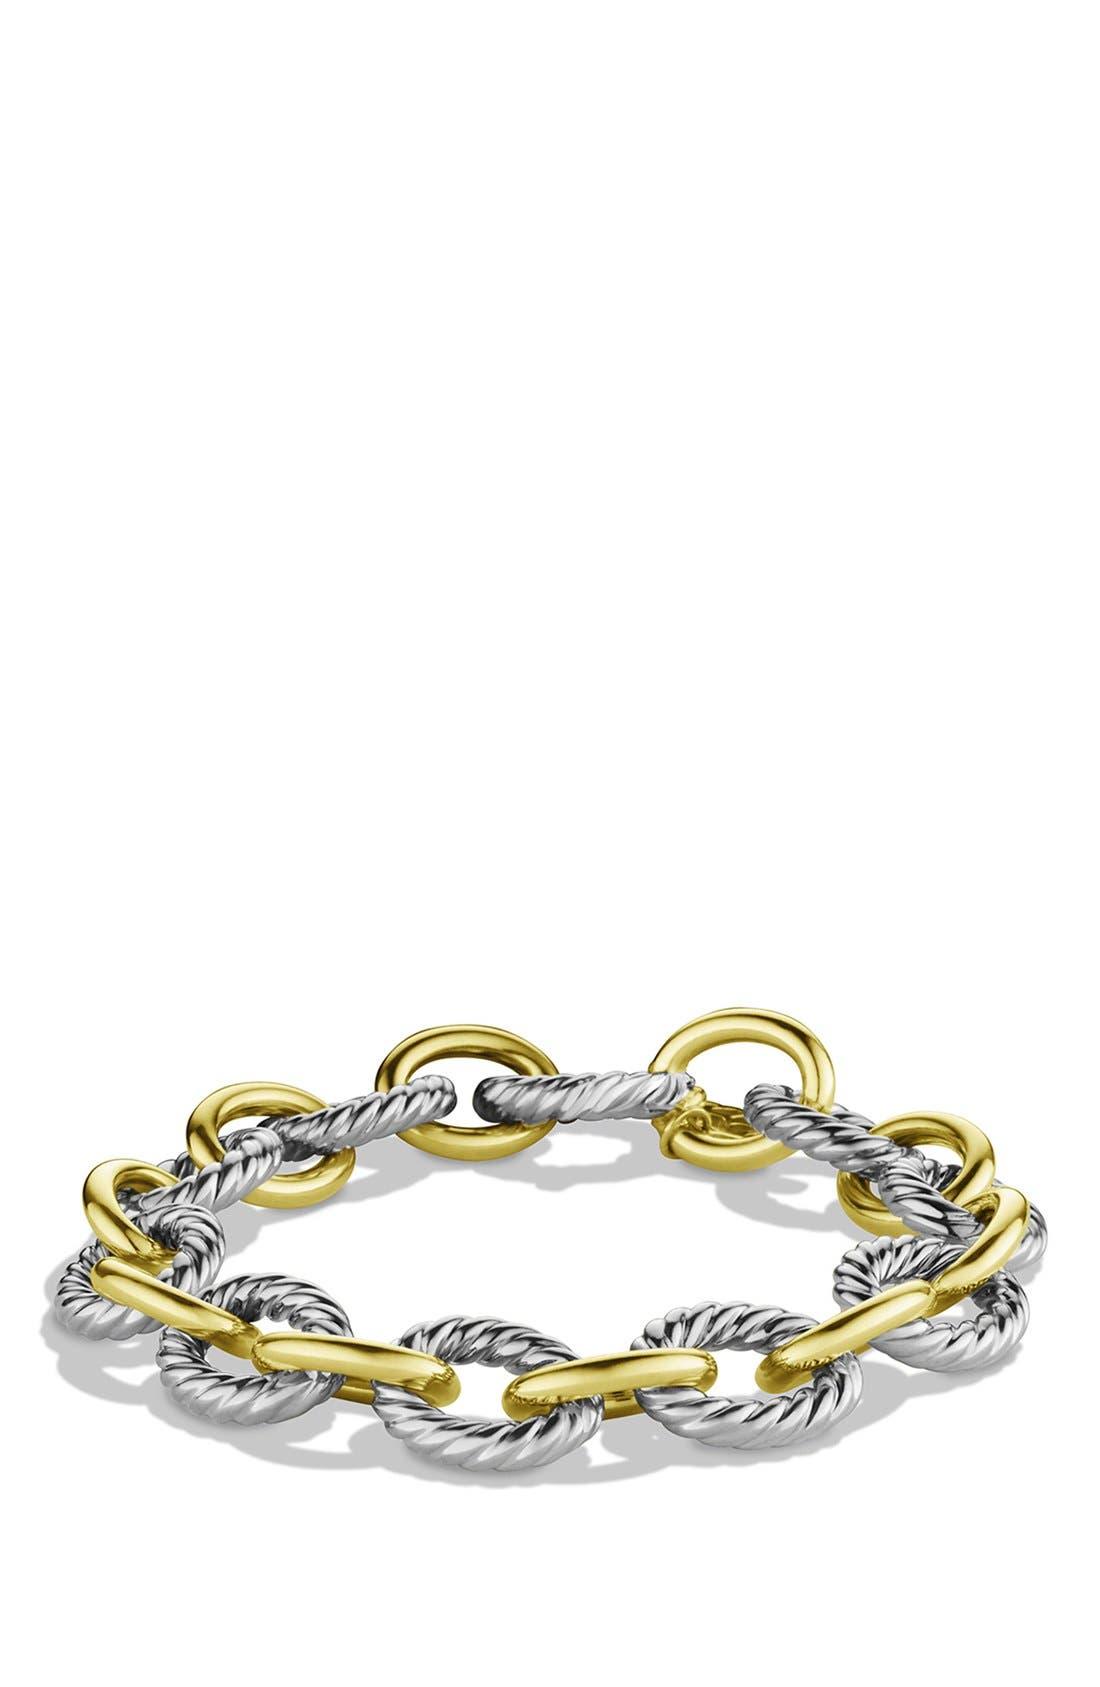 Main Image - David Yurman 'Oval' Large Link Bracelet with Gold